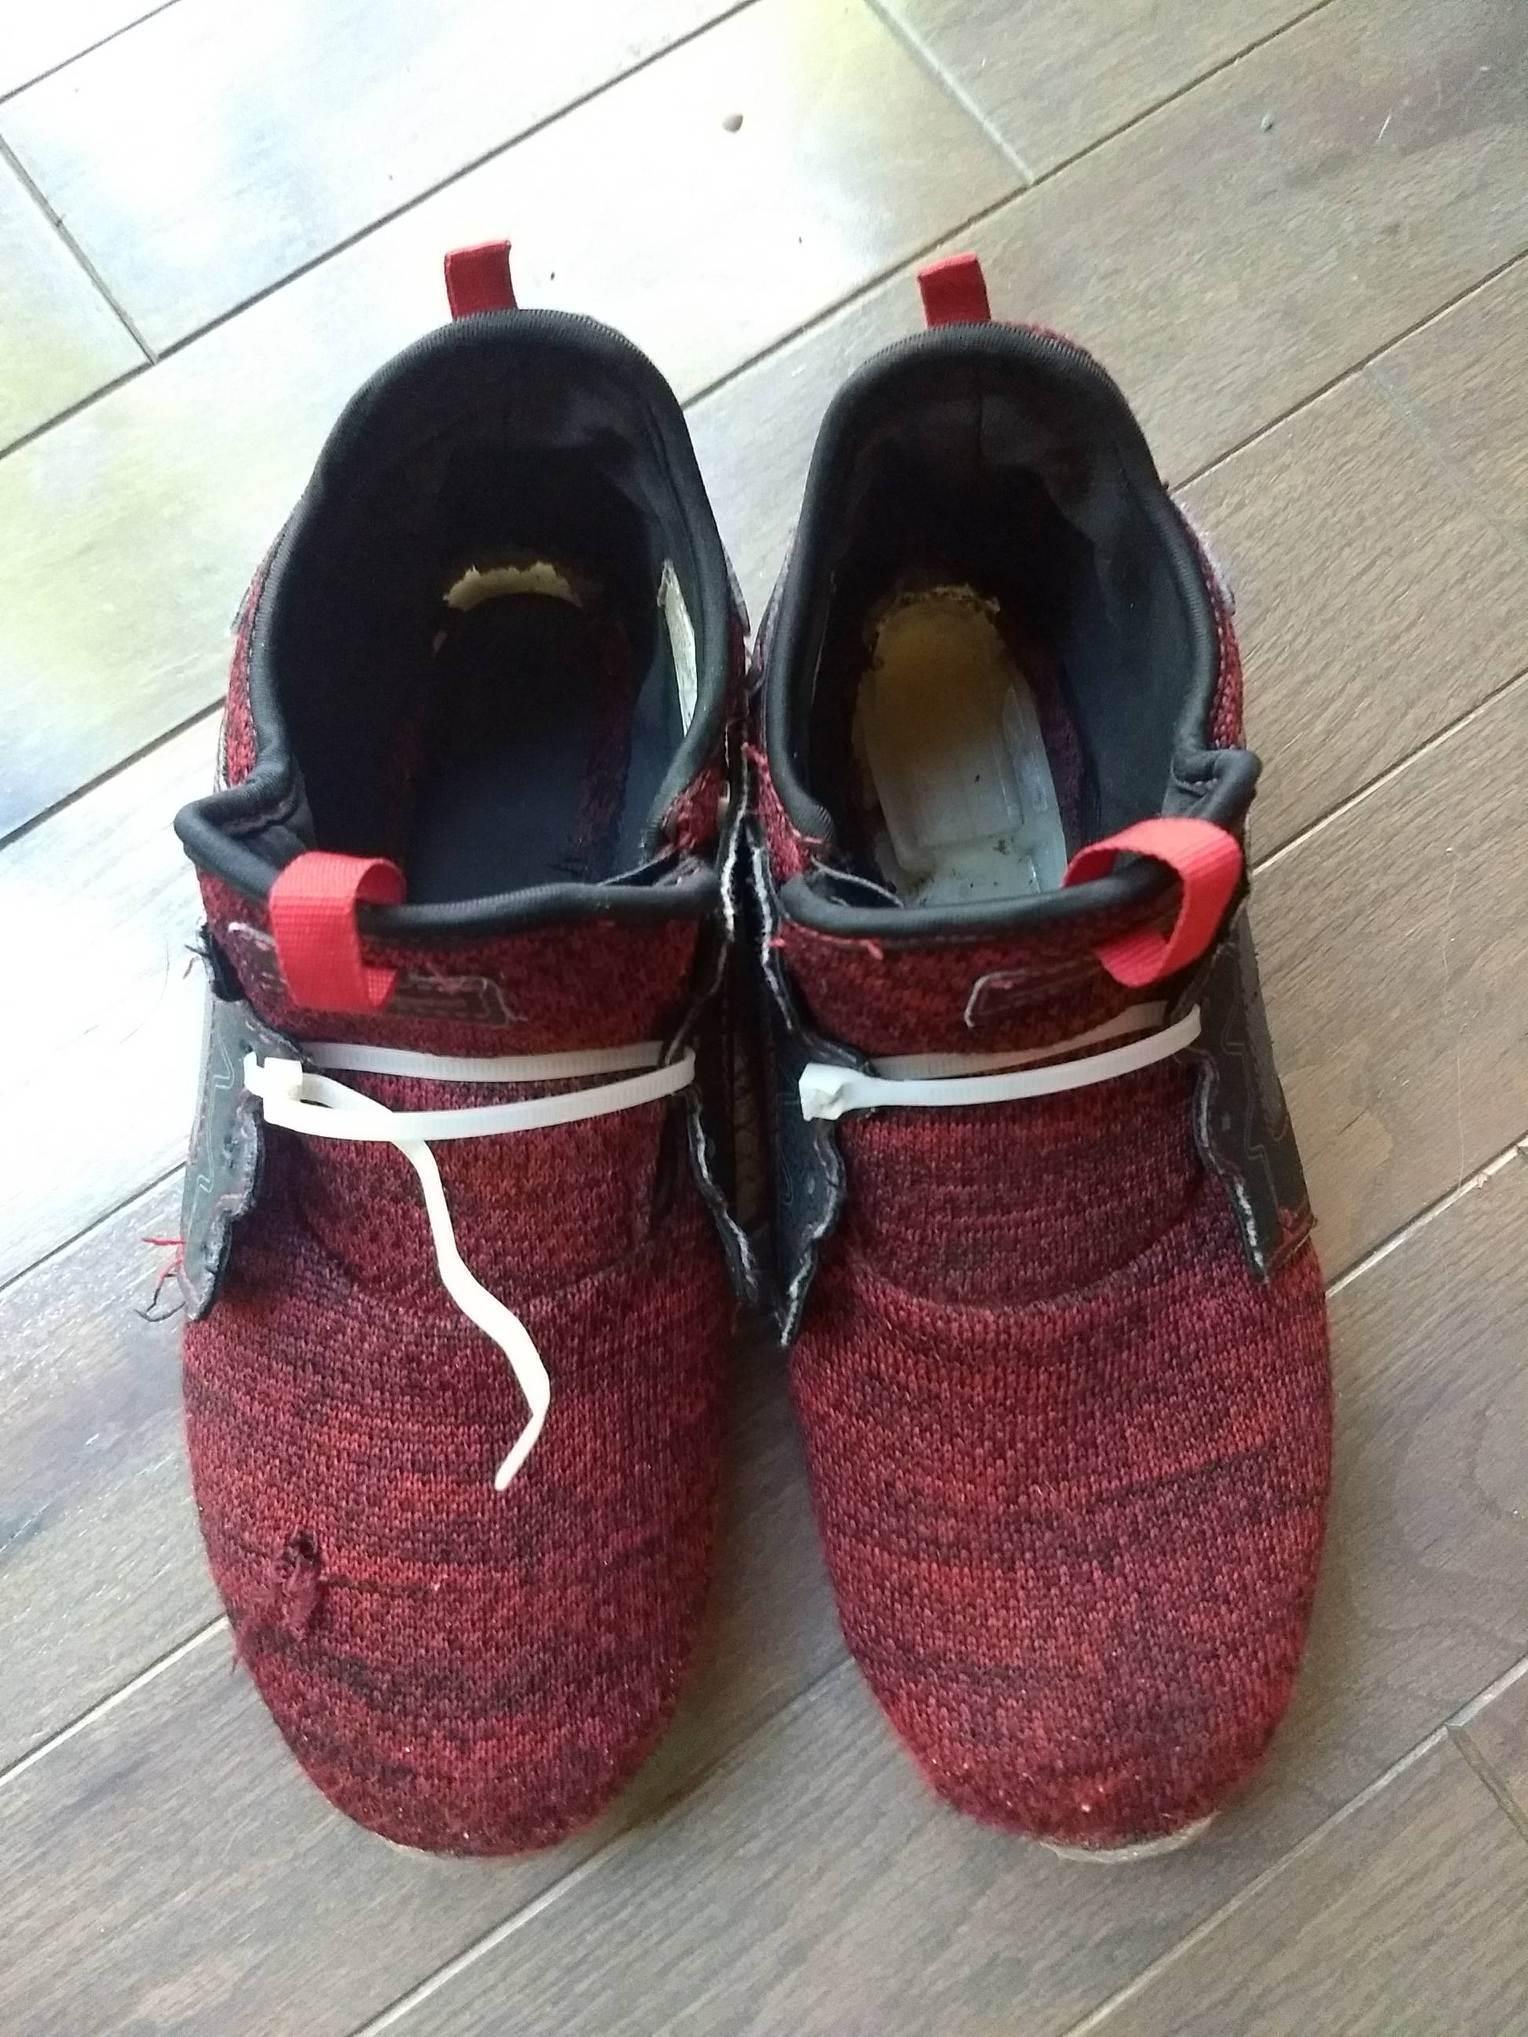 zip tied shoes.JPG